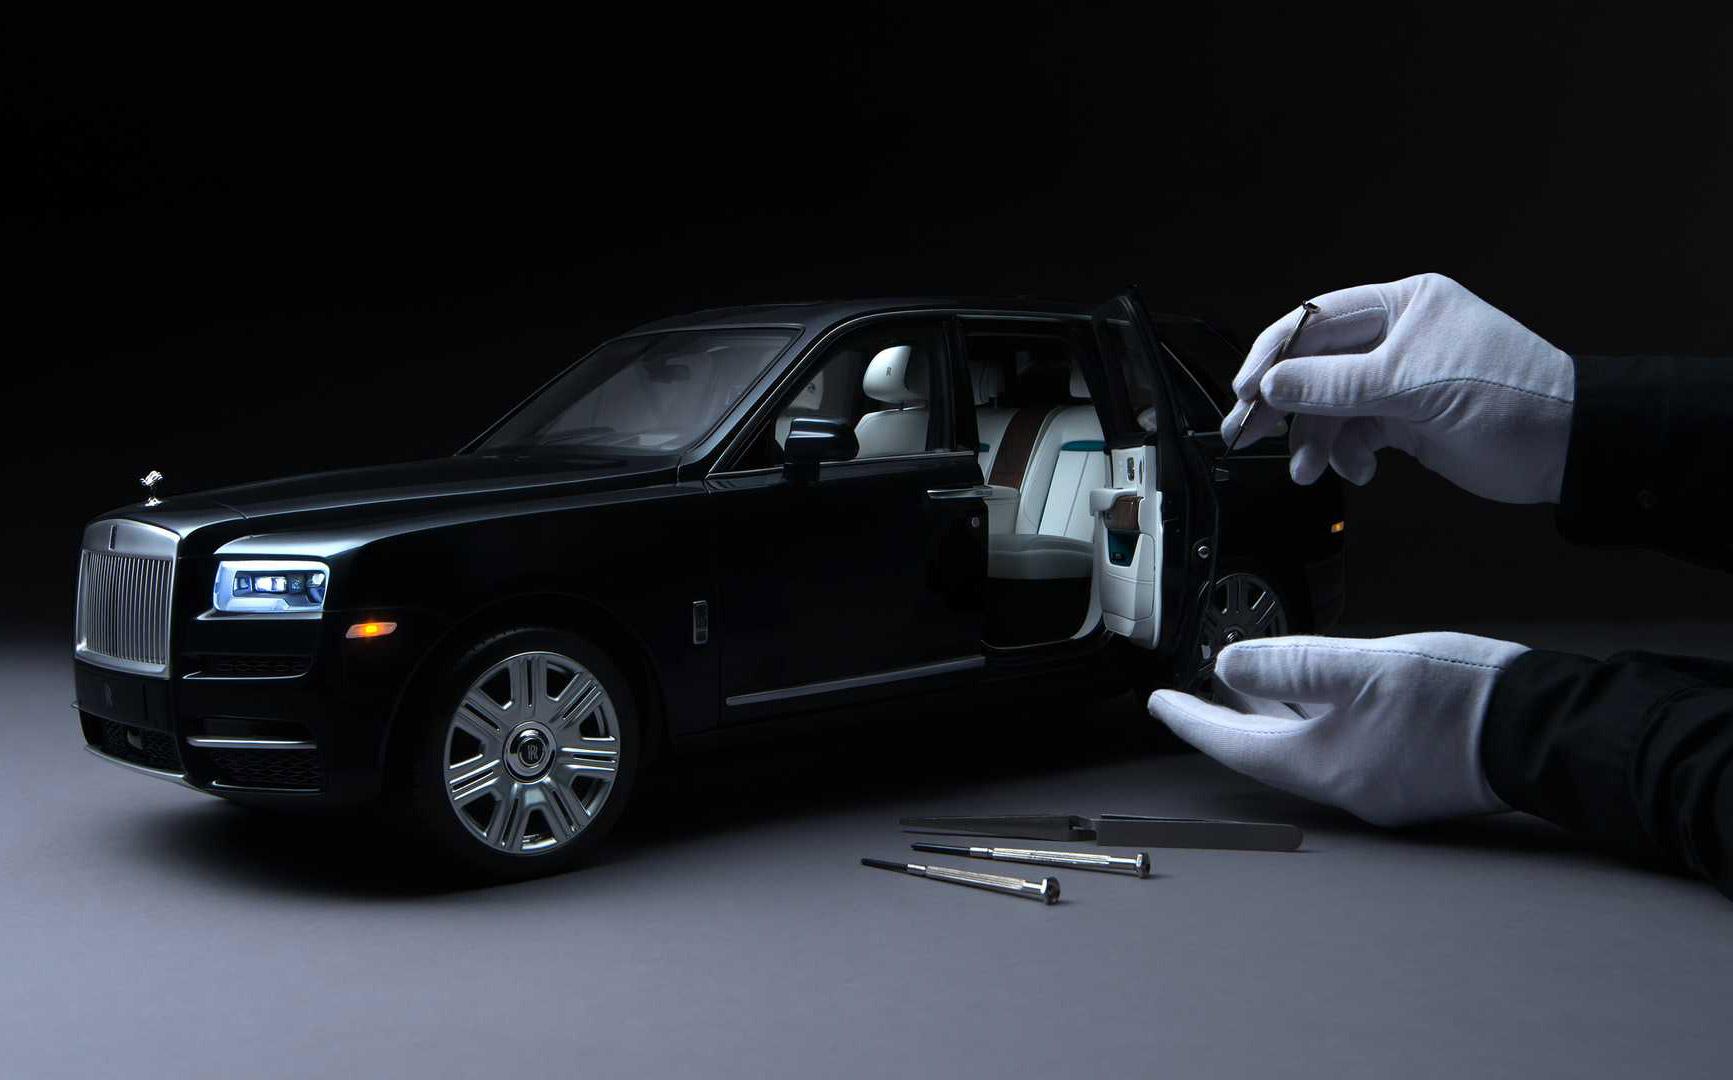 1:8 Scale Rolls-Royce Cullinan